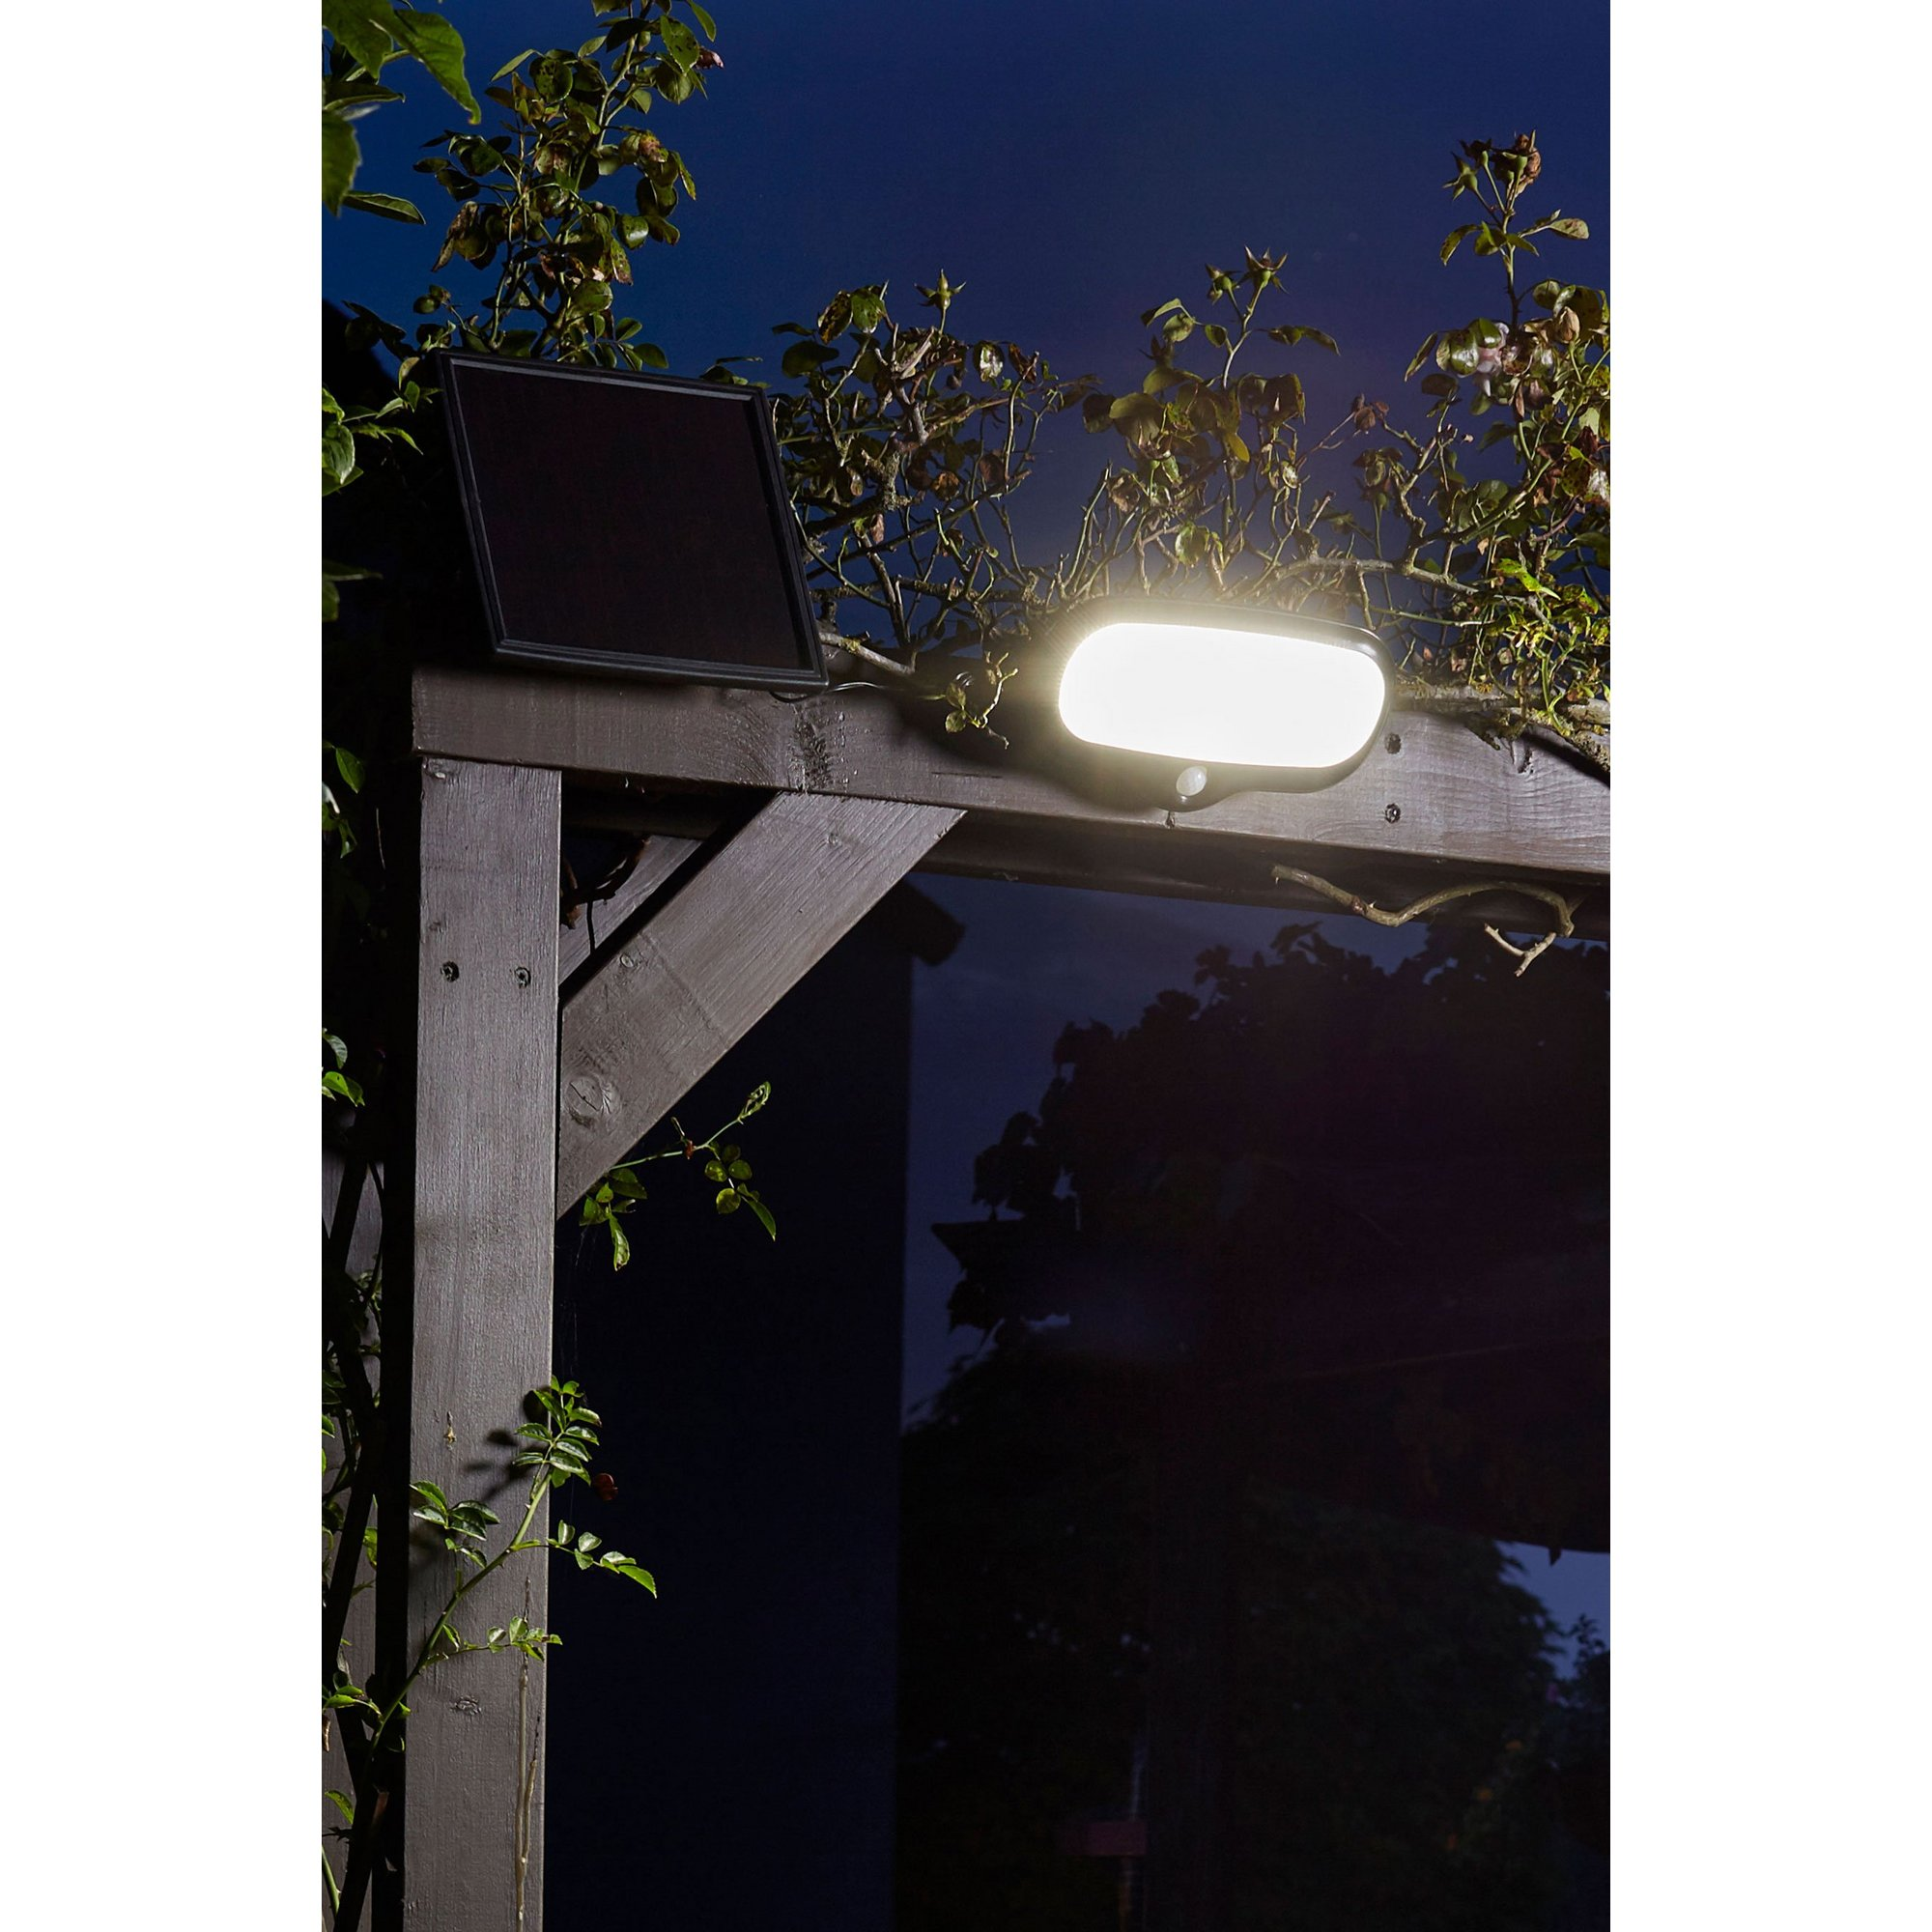 Image of PIR Security Floodlight